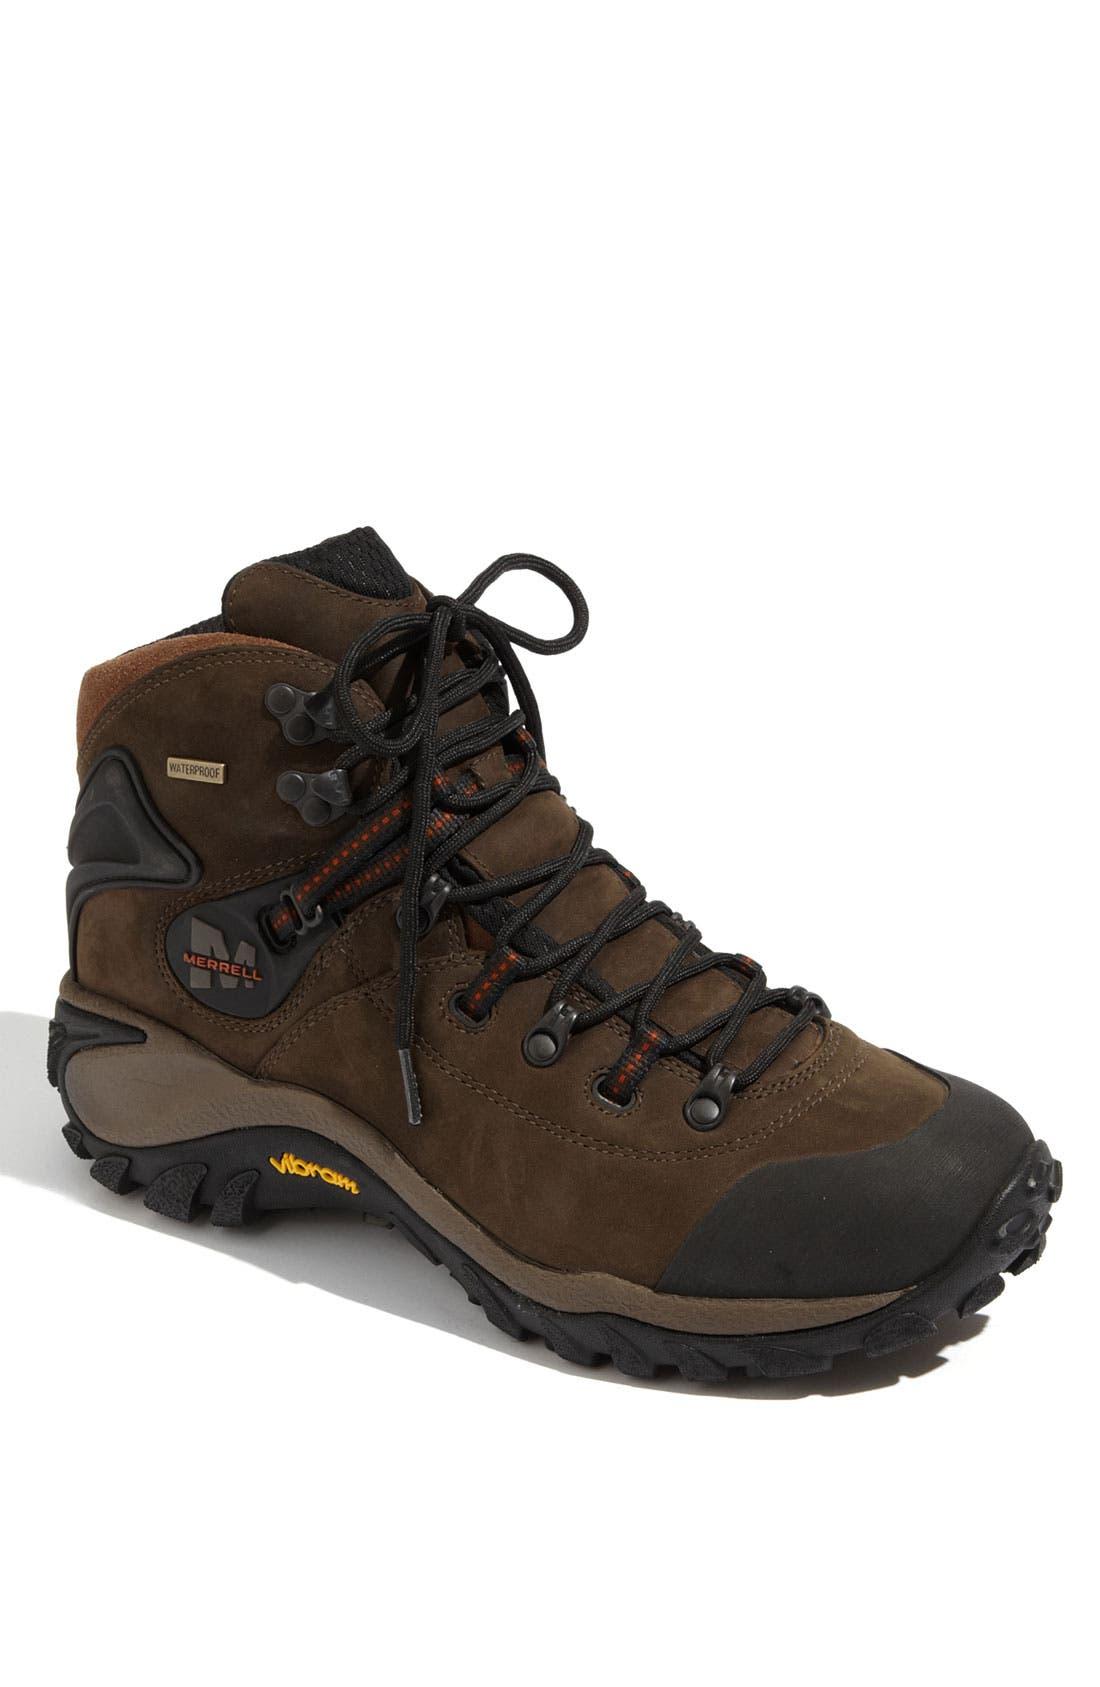 Alternate Image 1 Selected - Merrell 'Phaser Peak Waterproof' Boot (Online Only)